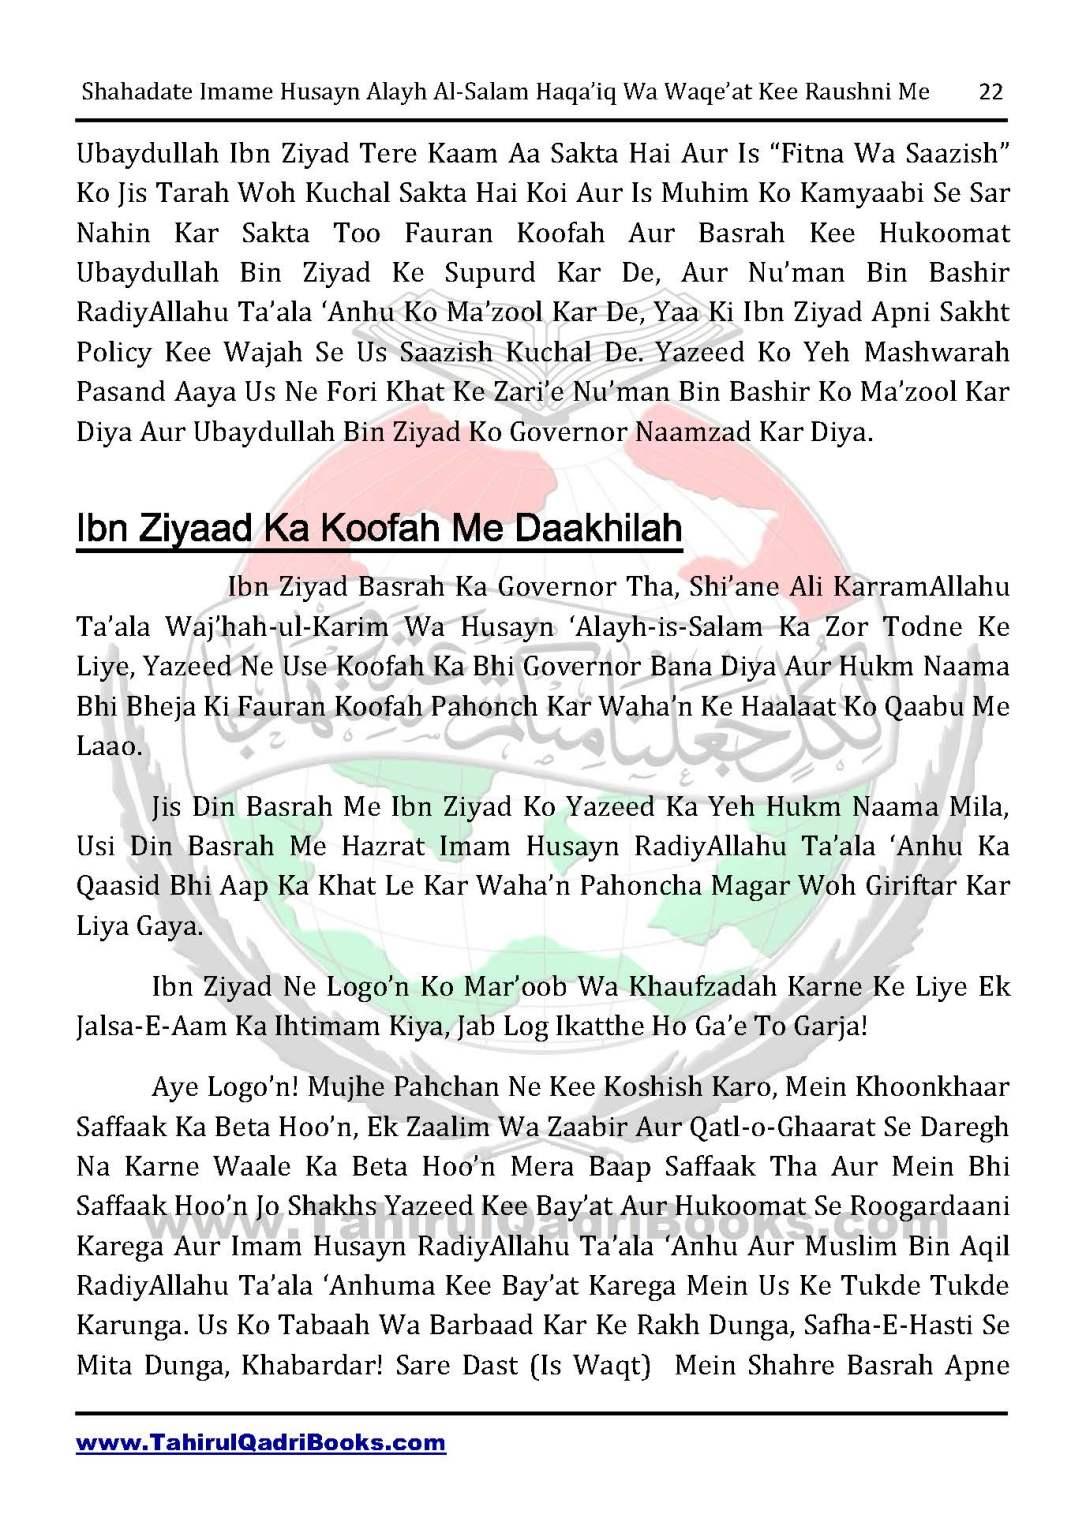 shahadate-imame-husayn-alayh-is-salam-haqaiq-wa-waqe_at-kee-raushni-me-in-roman-urdu-unlocked_Page_22